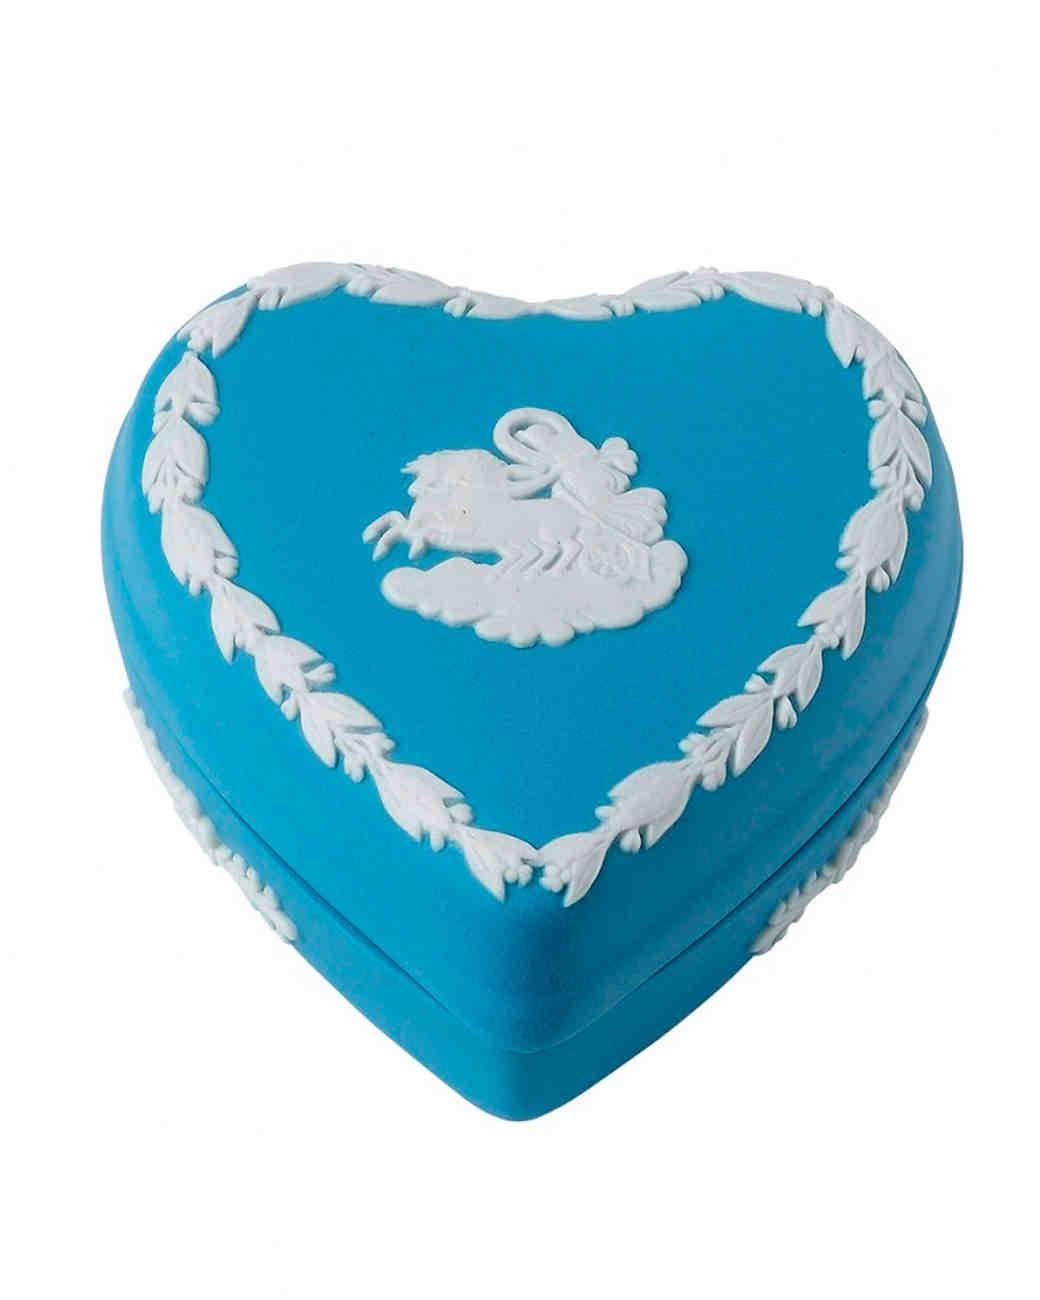 ring-boxes-wedgwood-jasperware-blue-0115.jpg